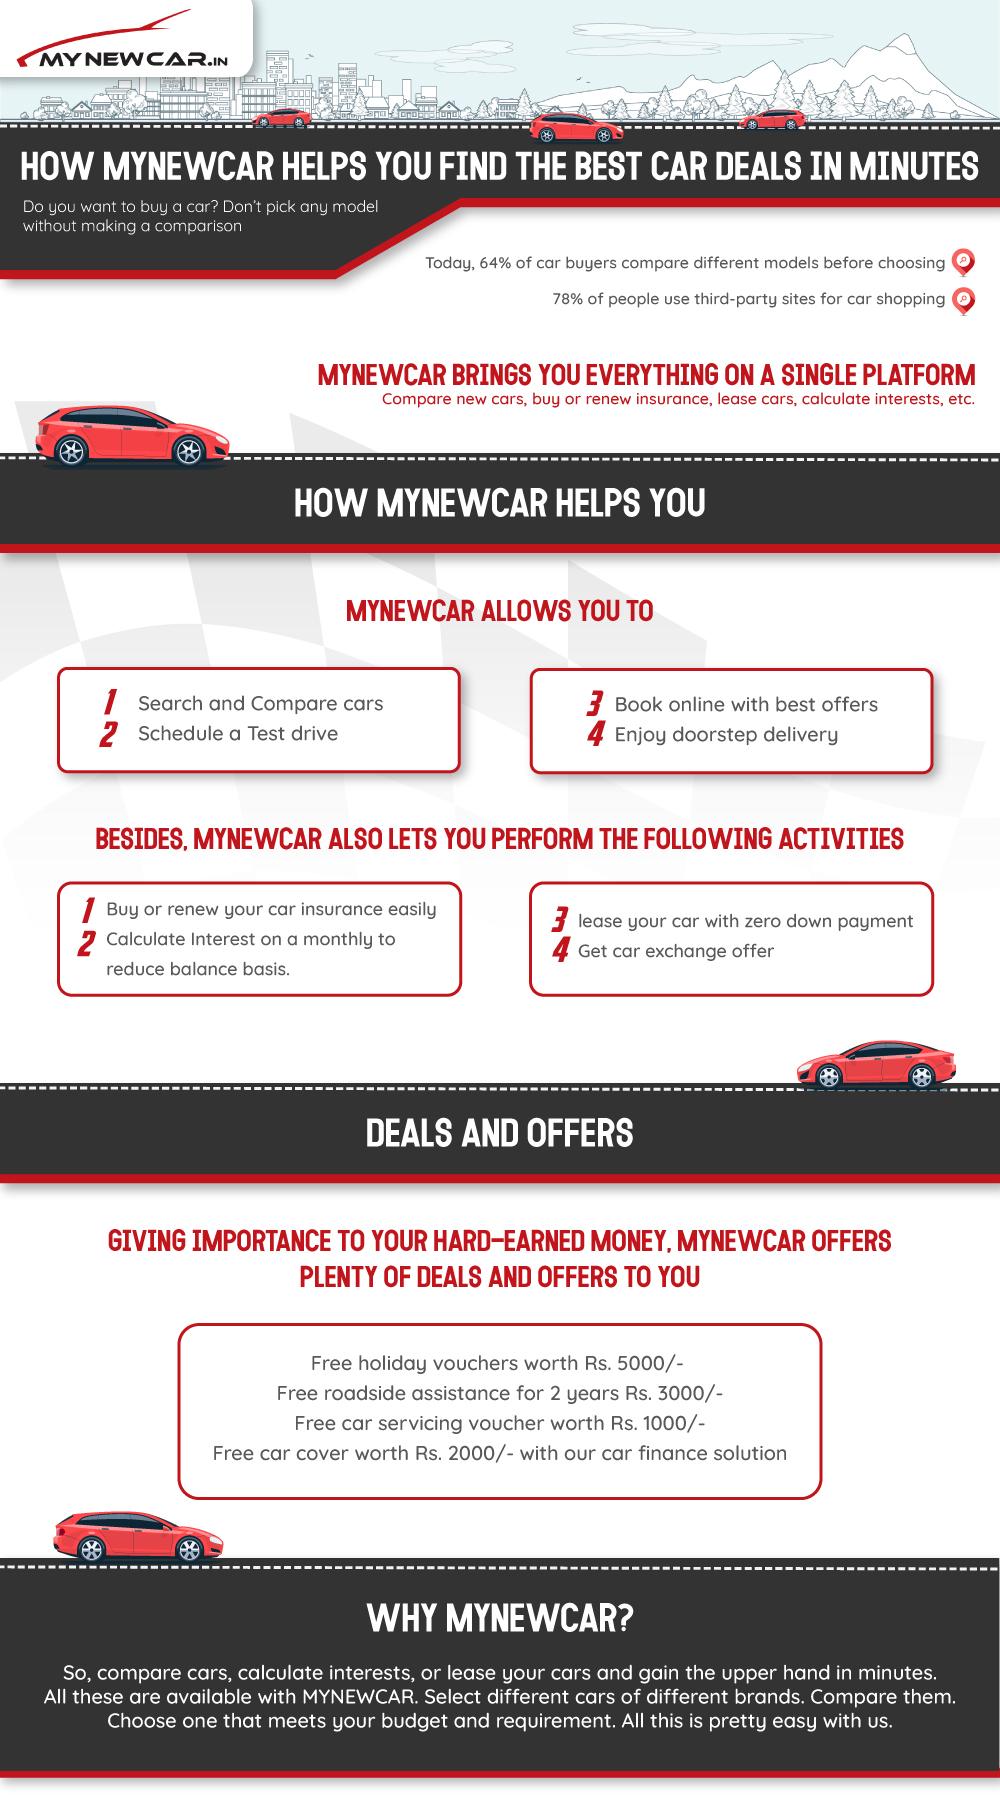 MyNewCar-Infographic